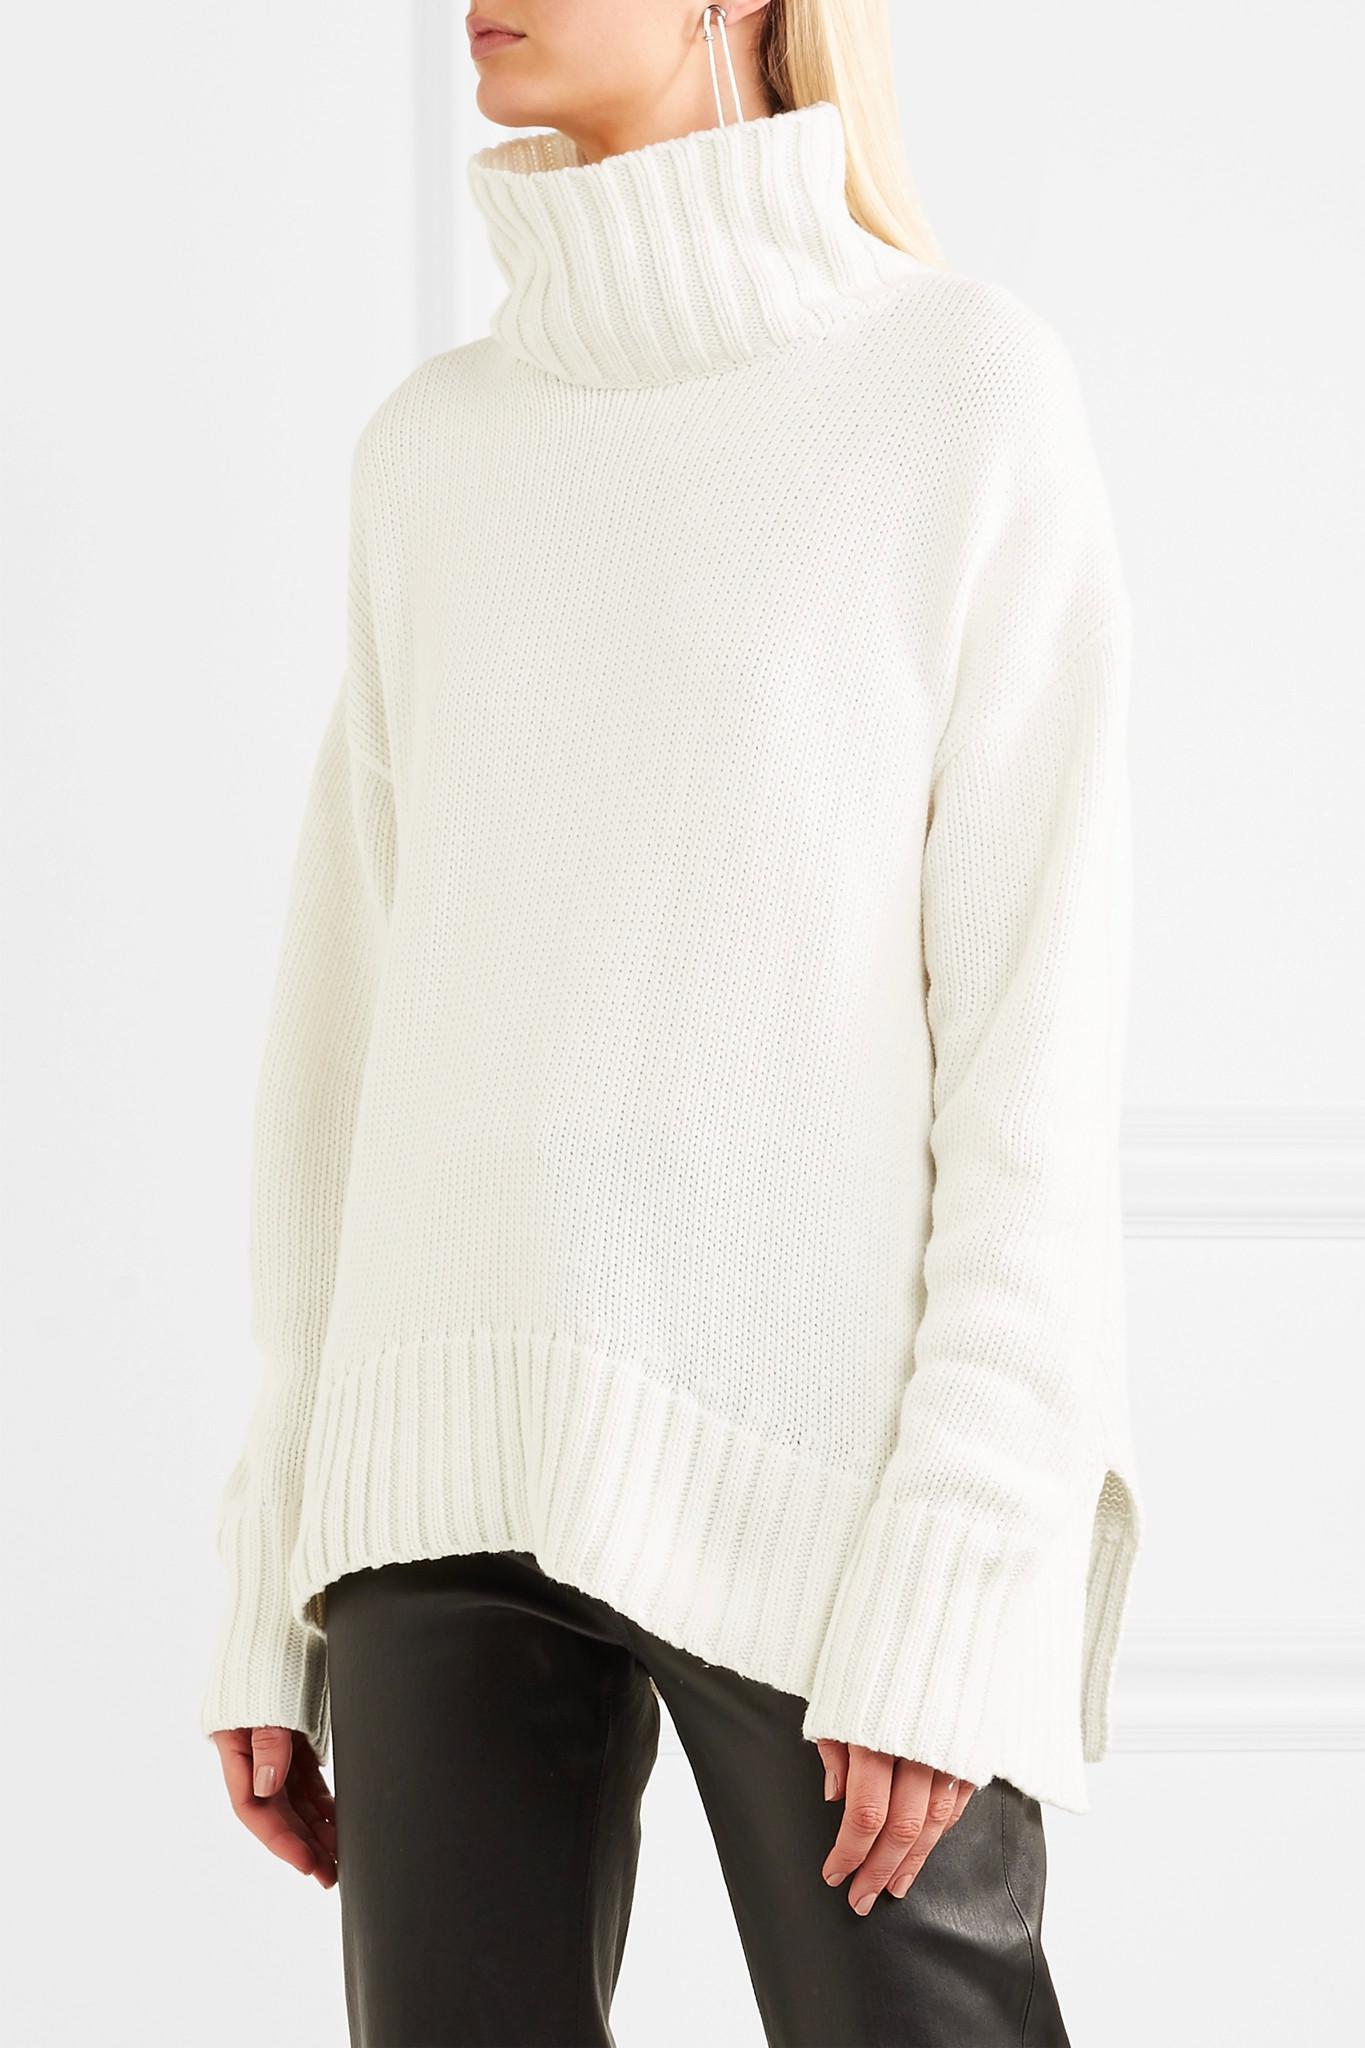 Joseph Sloppy Joe Cotton-blend Turtleneck Sweater in White | Lyst